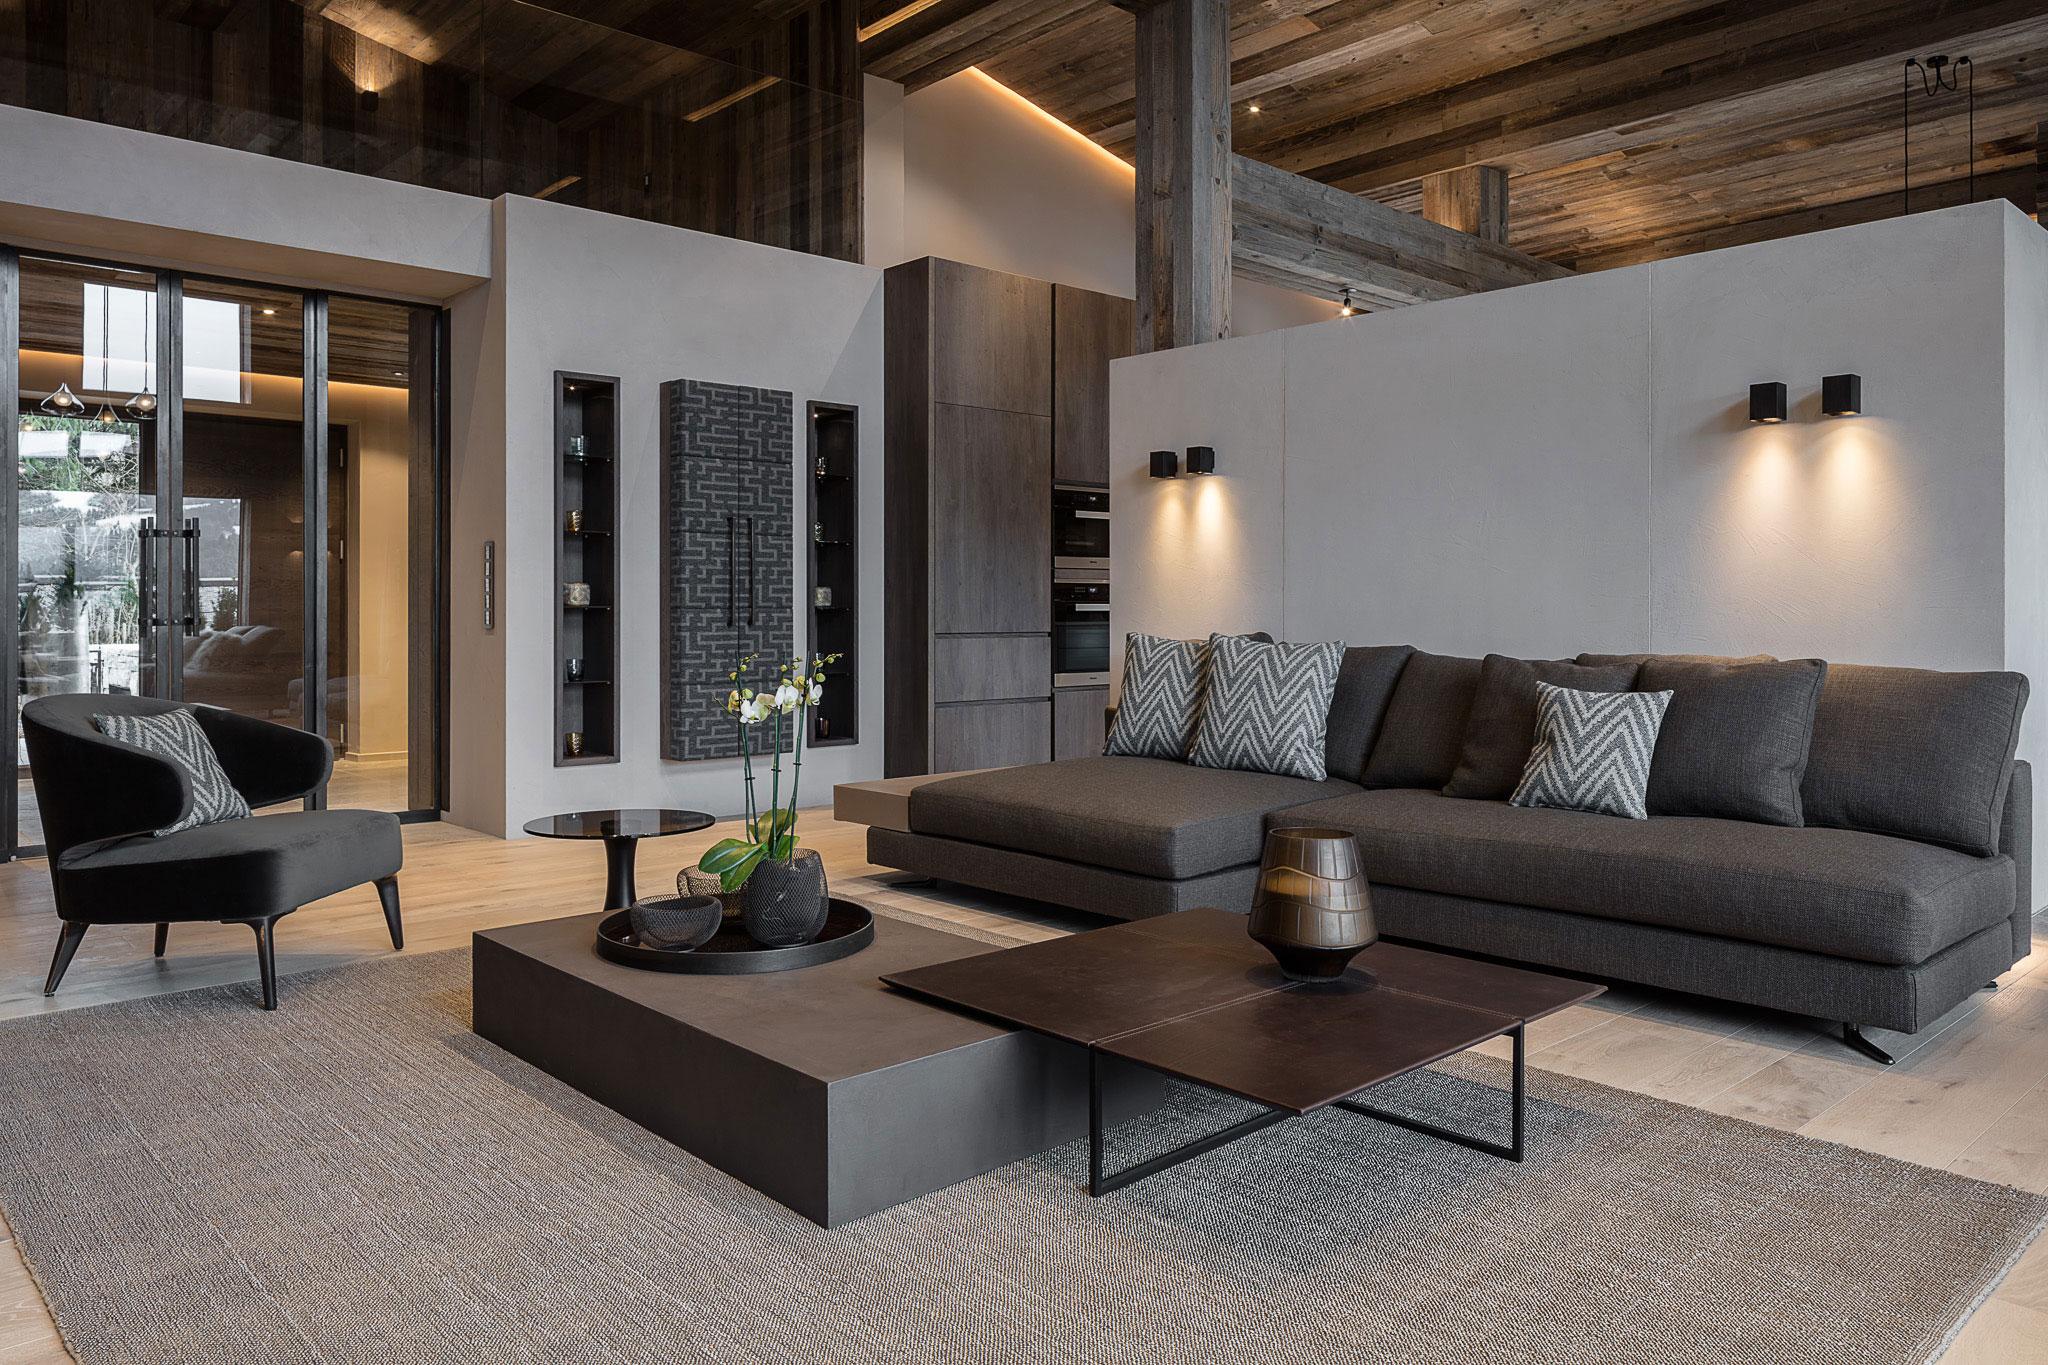 luxus-immobilie-kitzbuehel